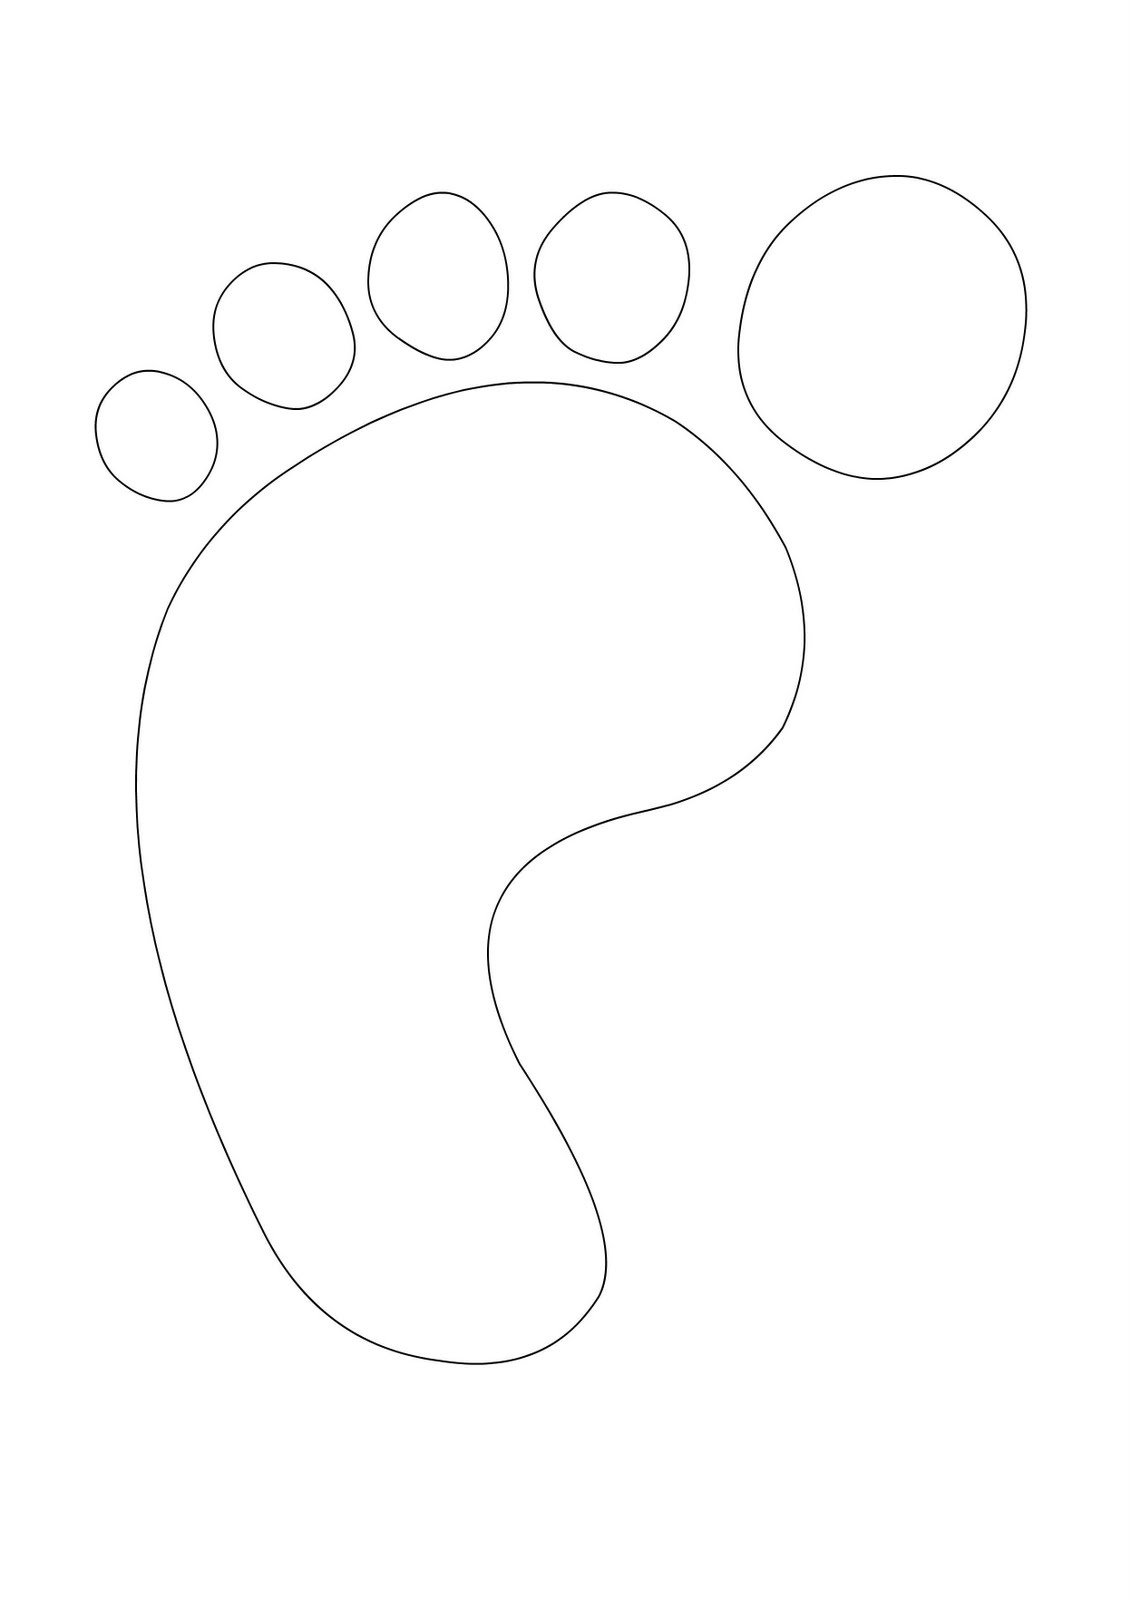 Free Footprint Template, Download Free Clip Art, Free Clip Art On - Free Printable Footprints